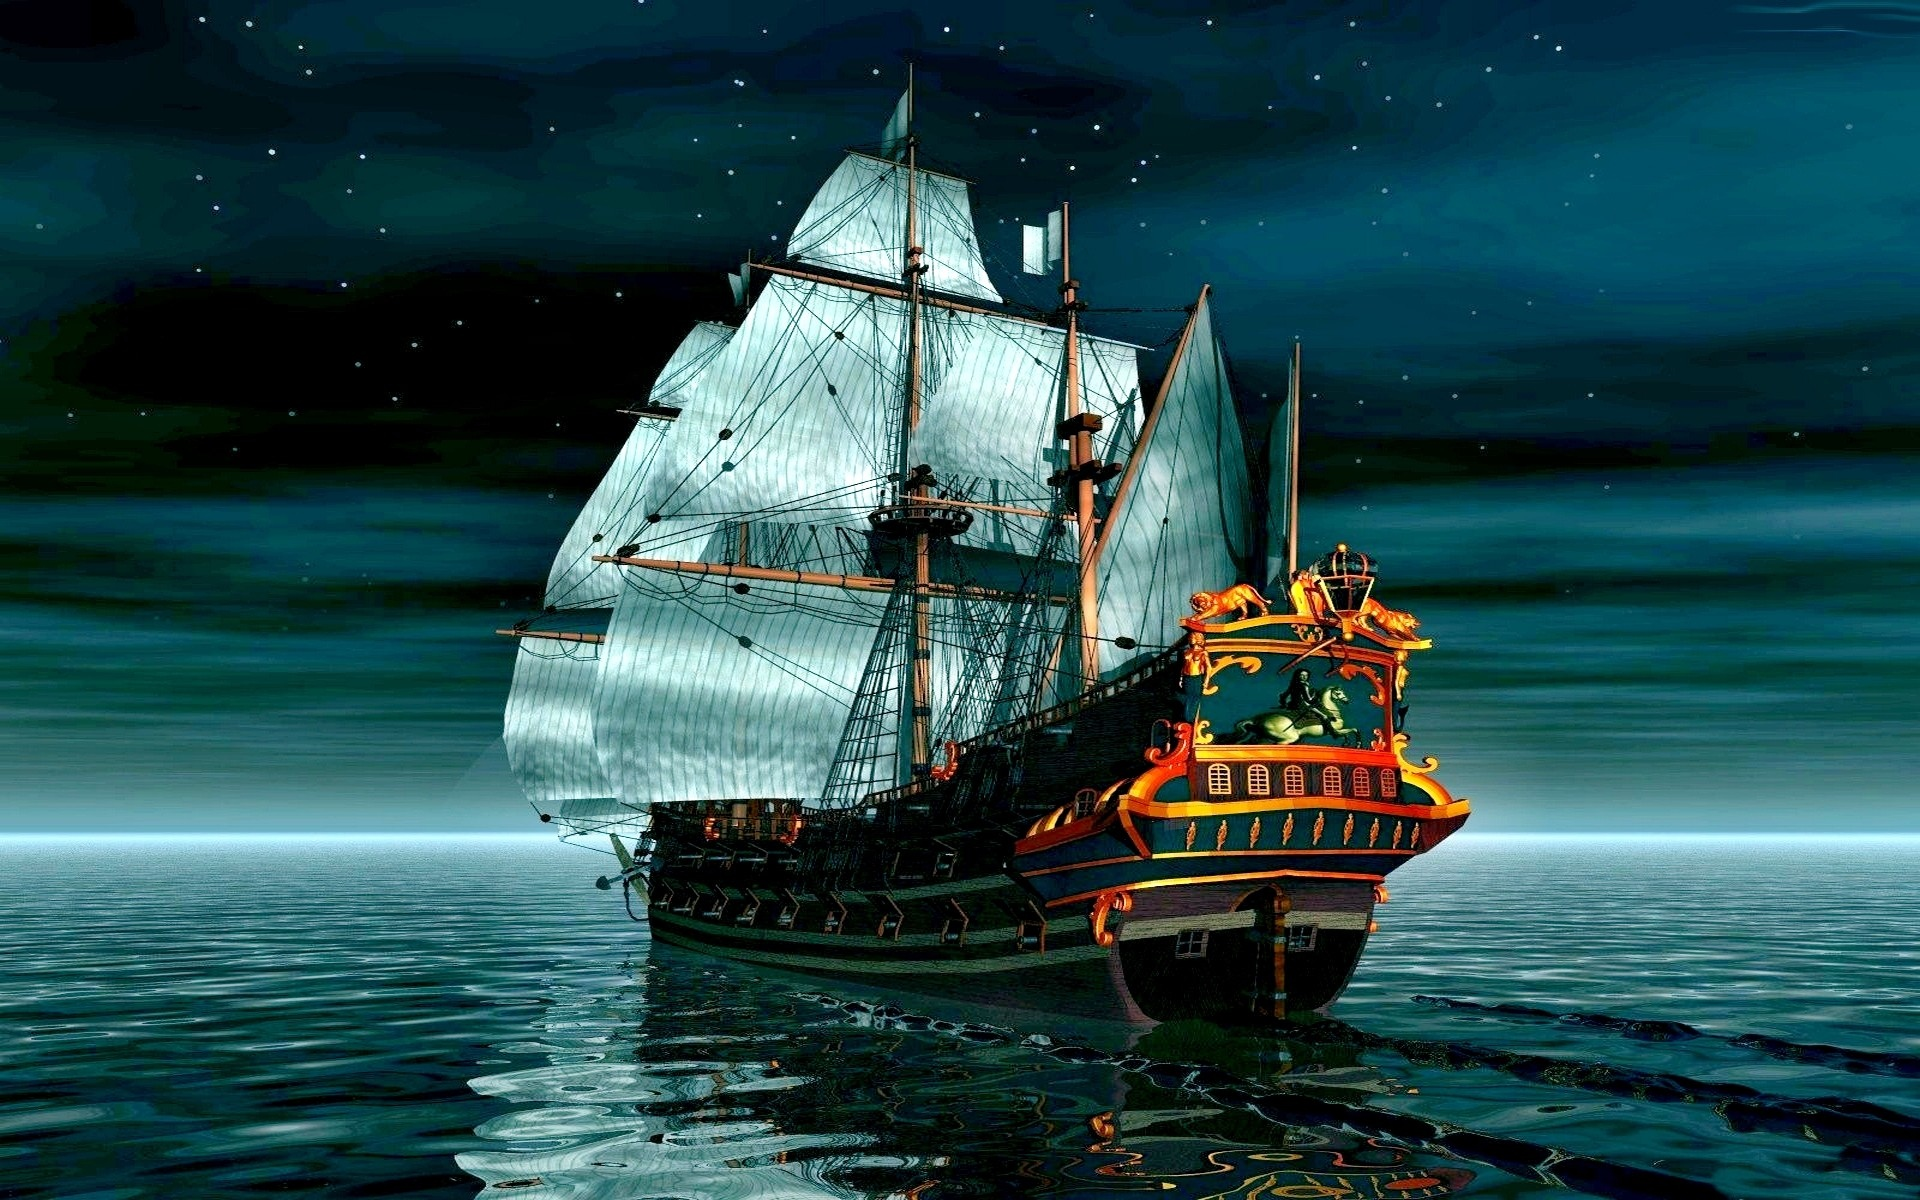 Ship Wallpapers HD 1920x1200